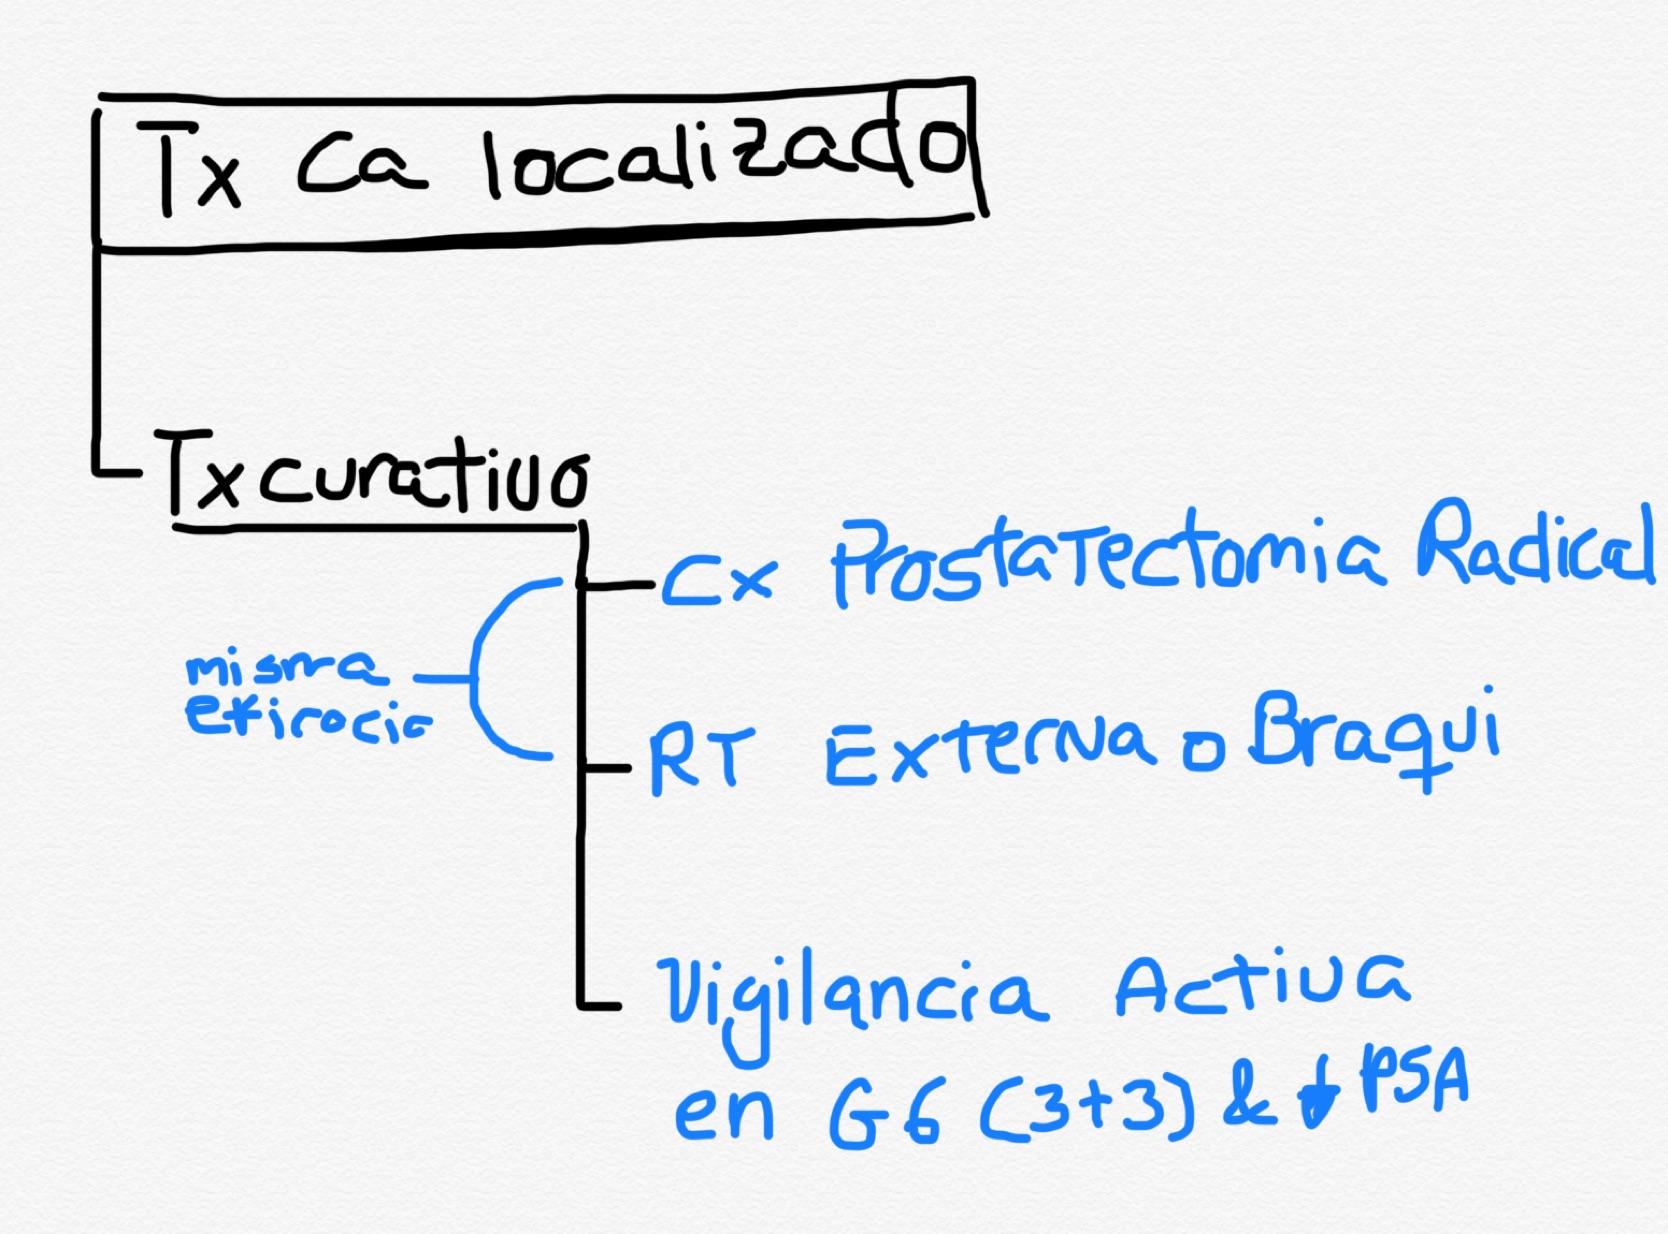 hipoecoico en próstata ecotransrectal